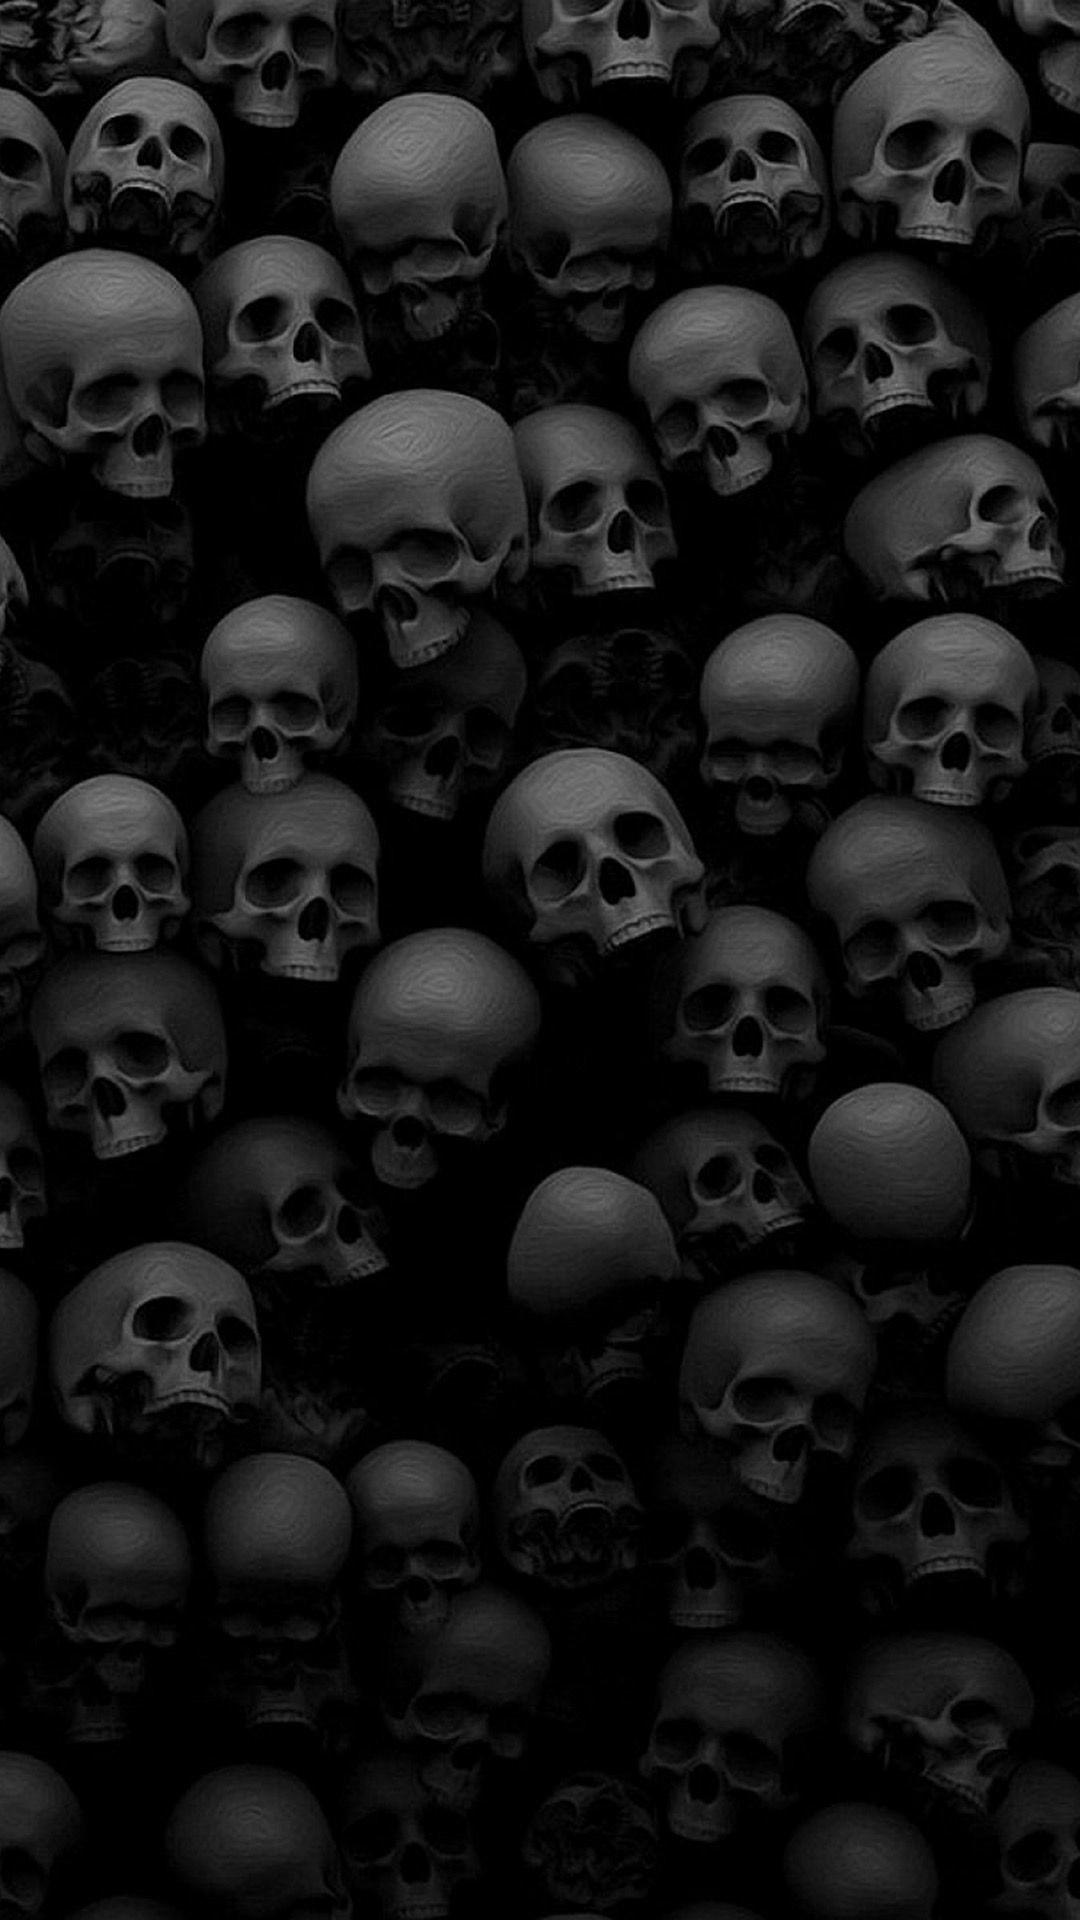 Totenkopf Wallpaper HD (73+ images)